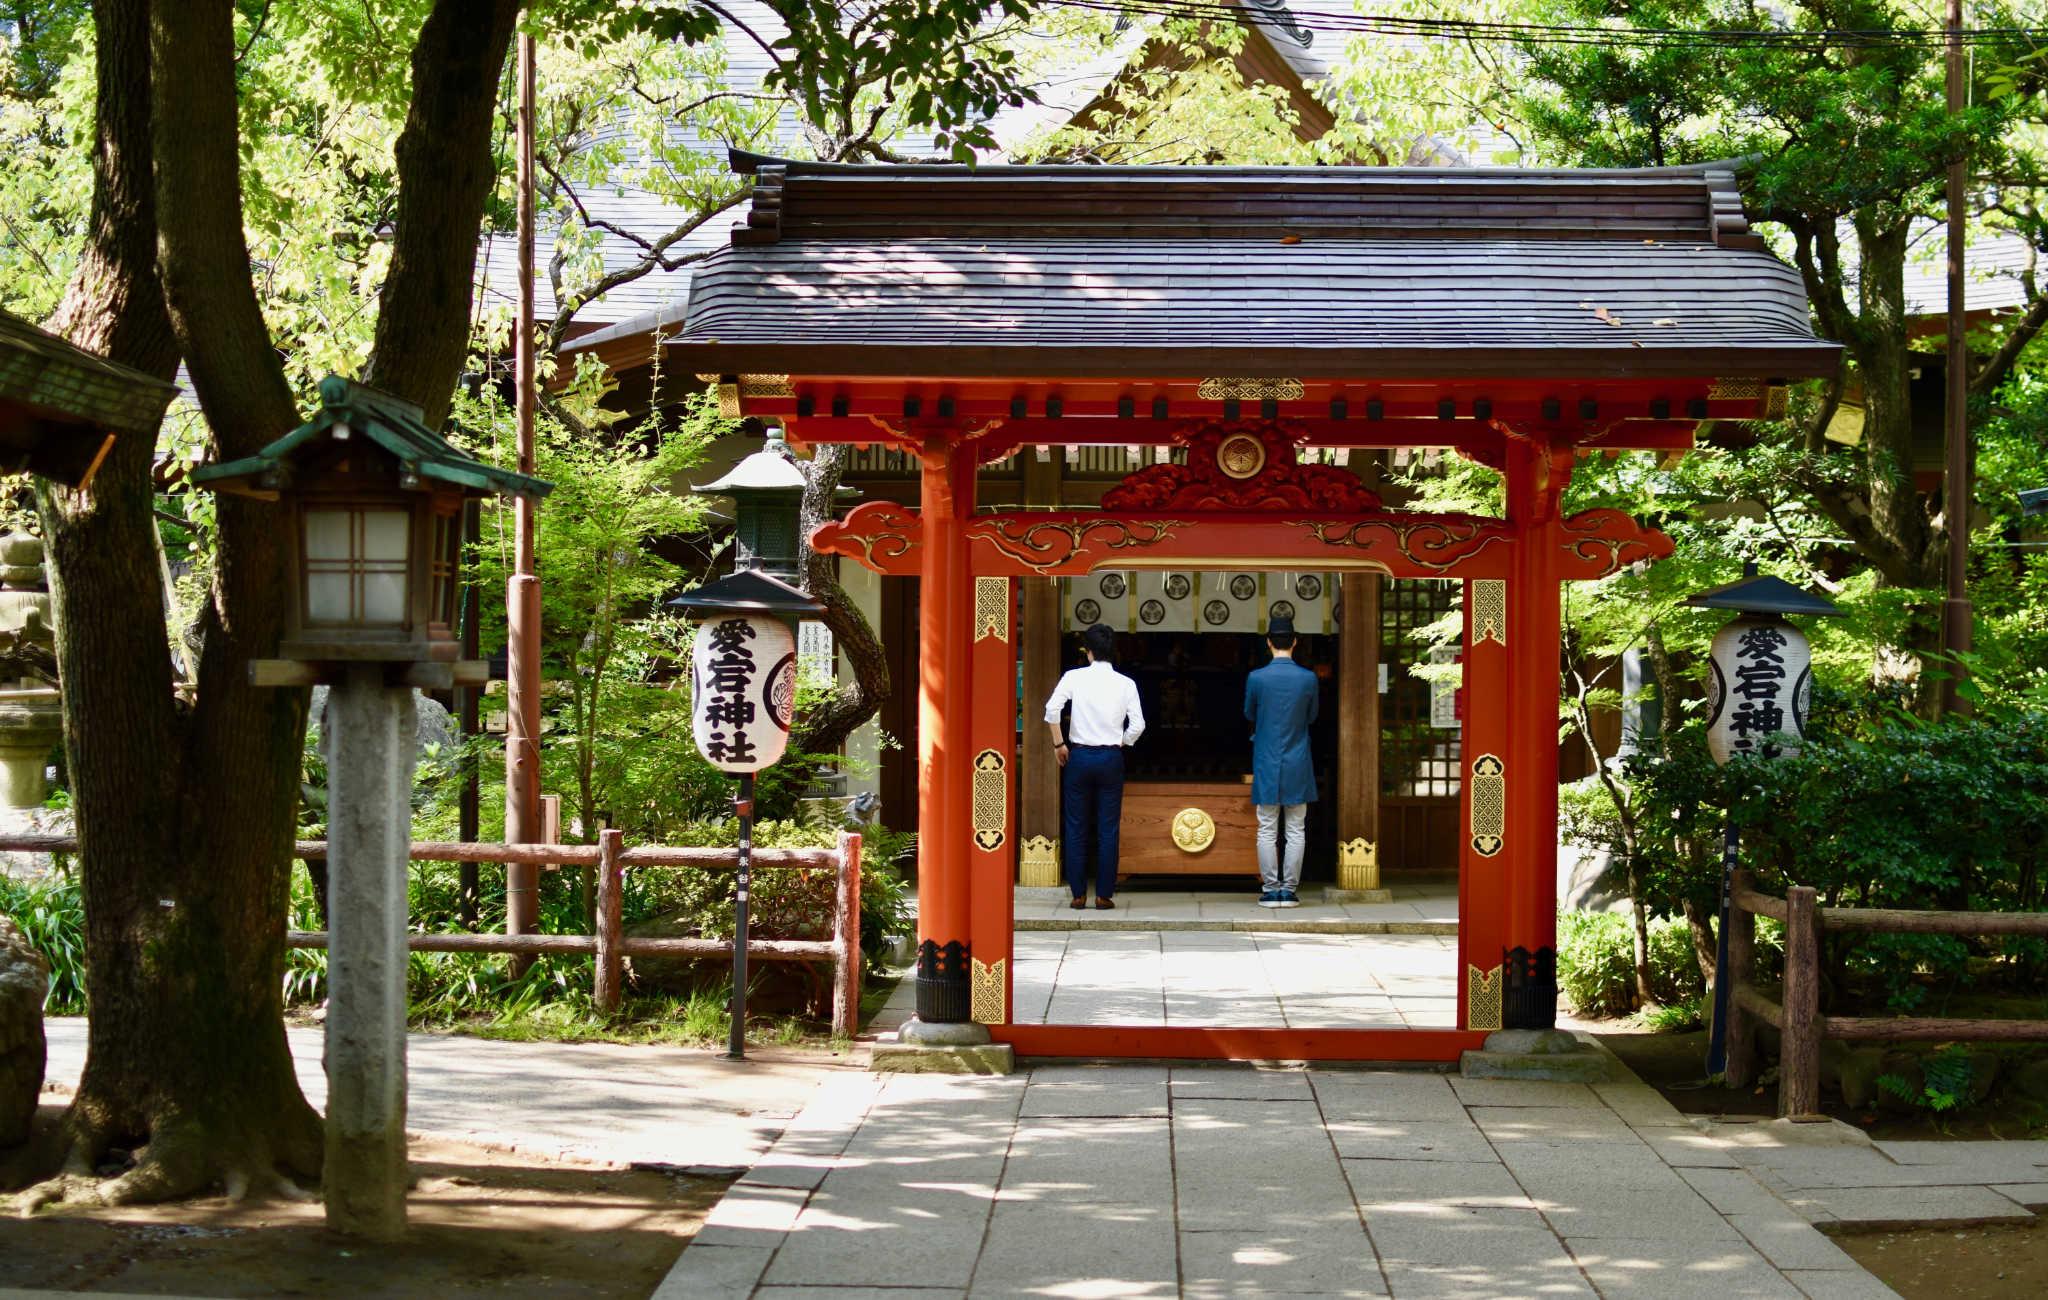 La porte qui mène au principal lieu de prière